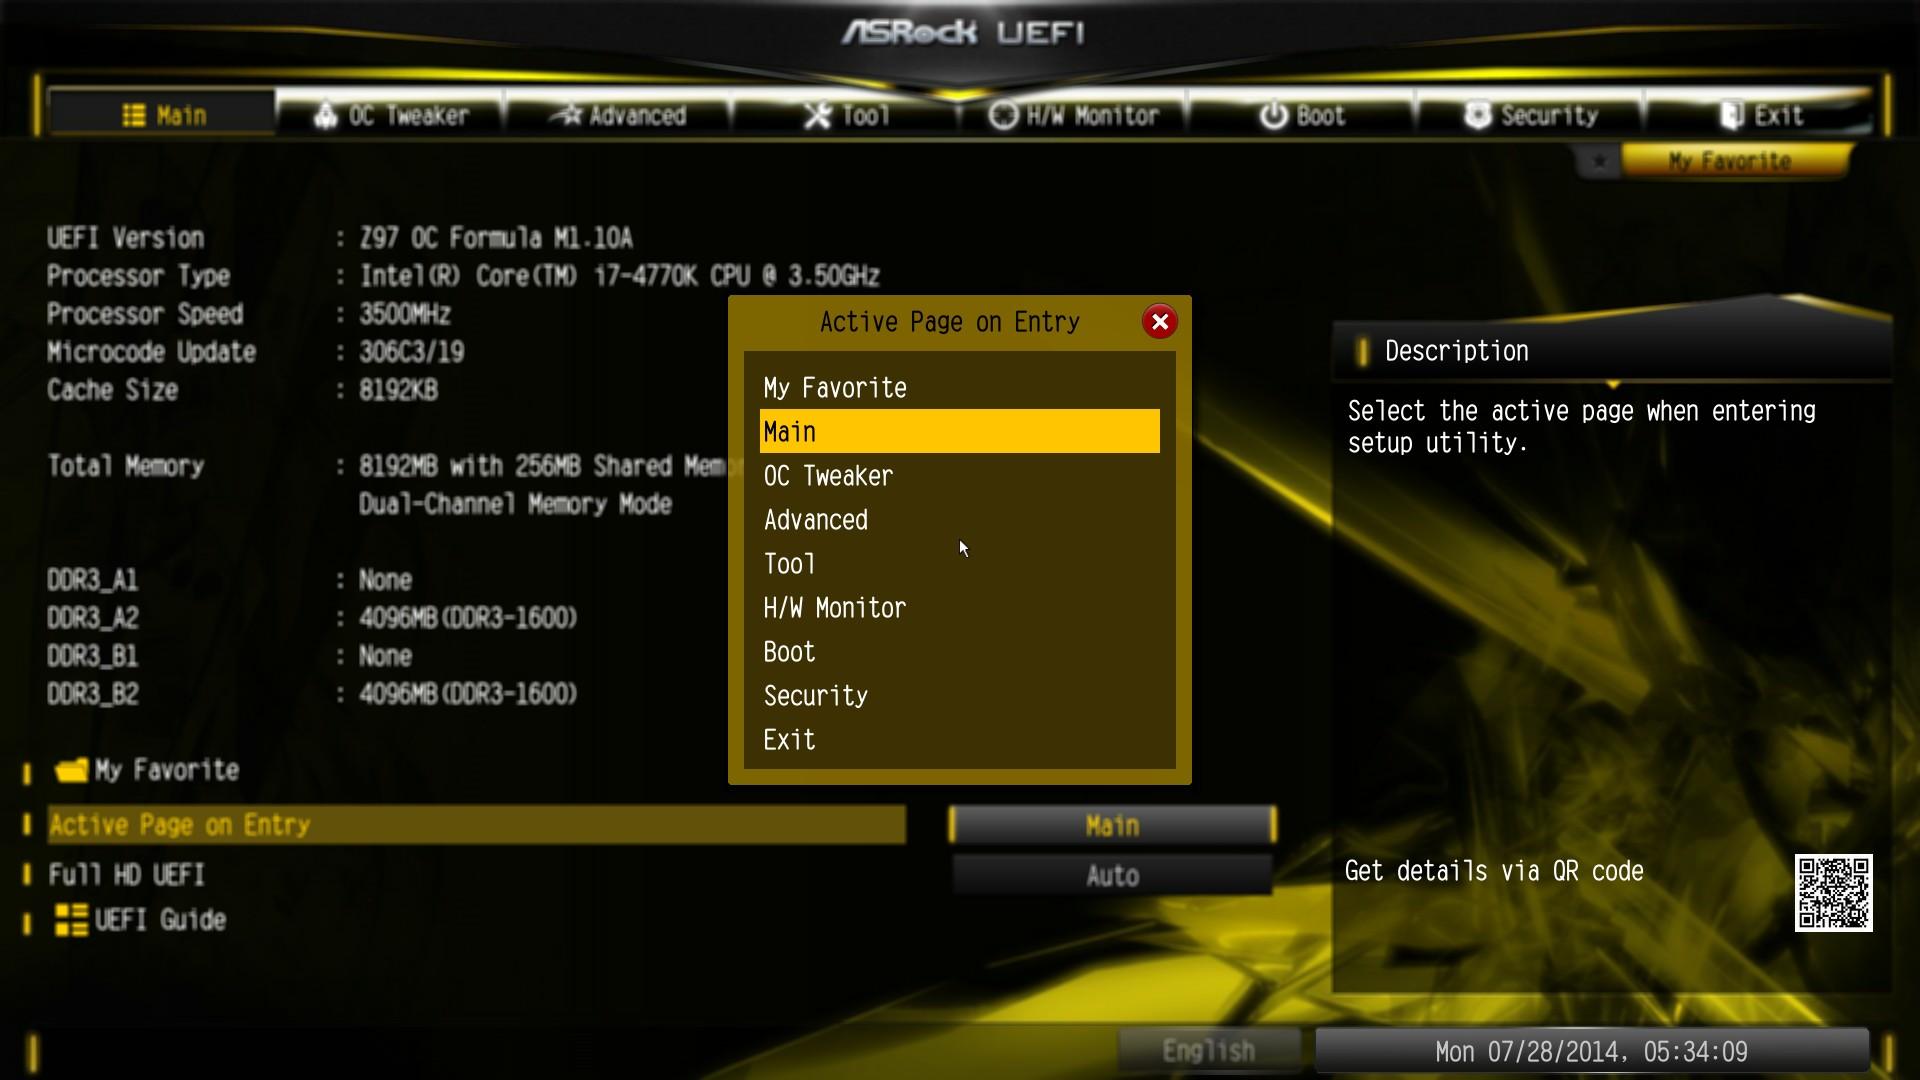 ASRock Z97 OC Formula: BIOS - ASRock Z97 OC Formula Motherboard